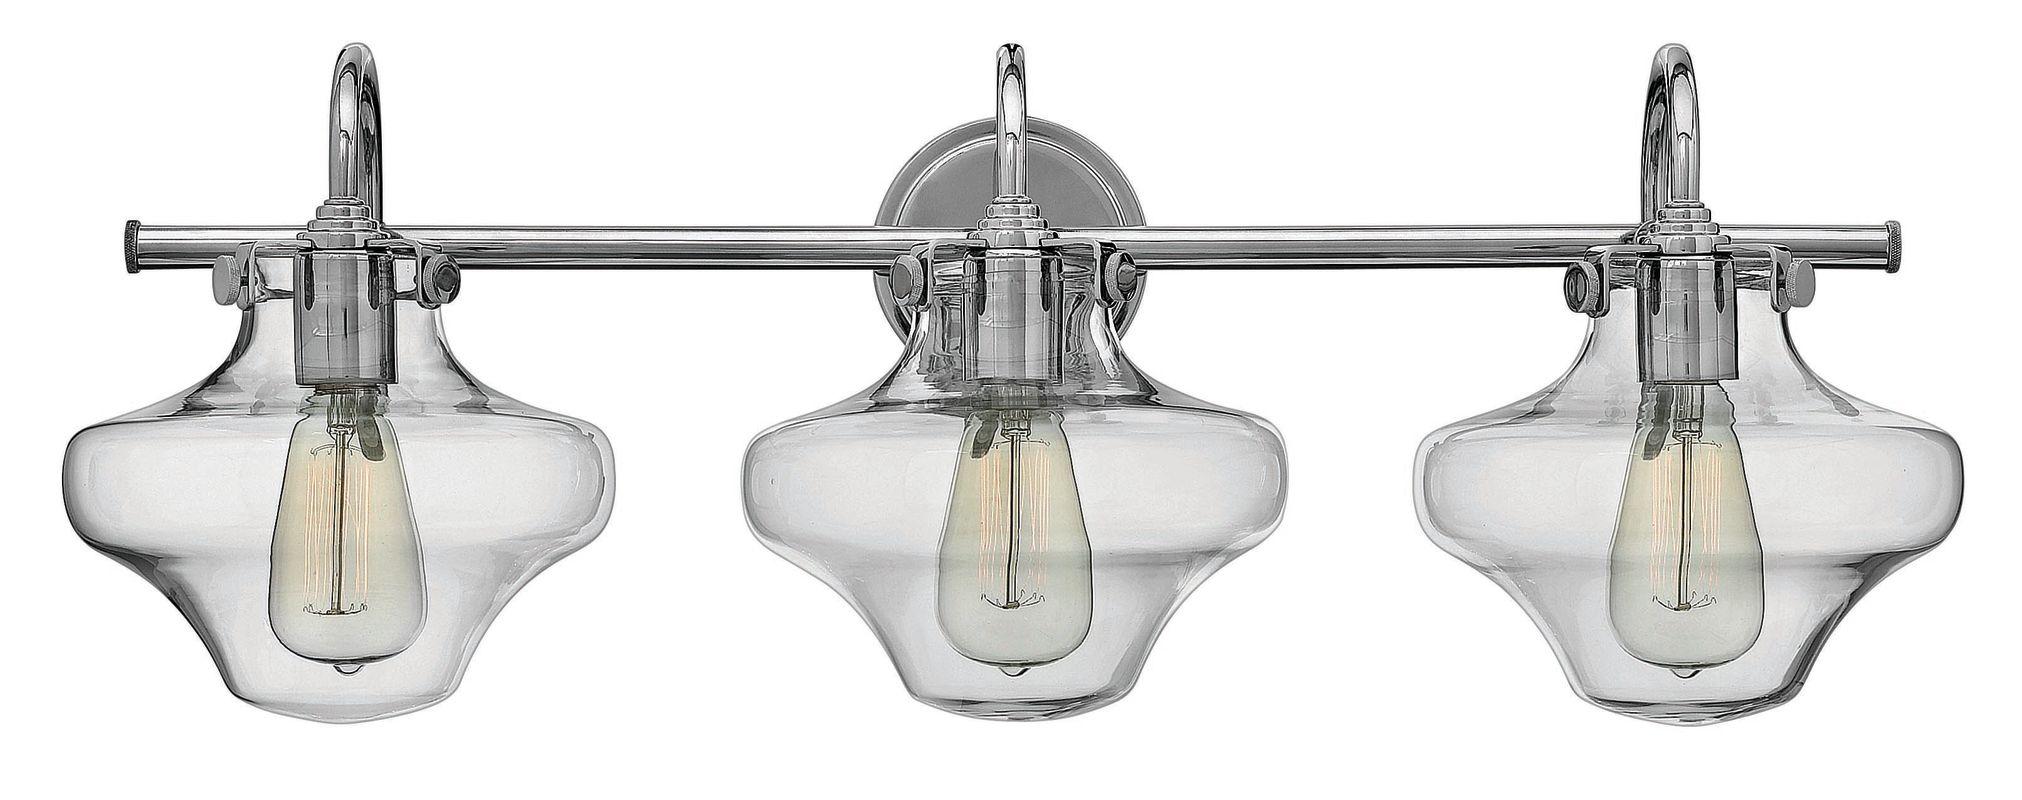 Hinkley Lighting 50031CM Chrome Industrial Congress Bathroom Light Sale $479.00 ITEM: bci2362253 ID#:50031CM UPC: 640665500684 :